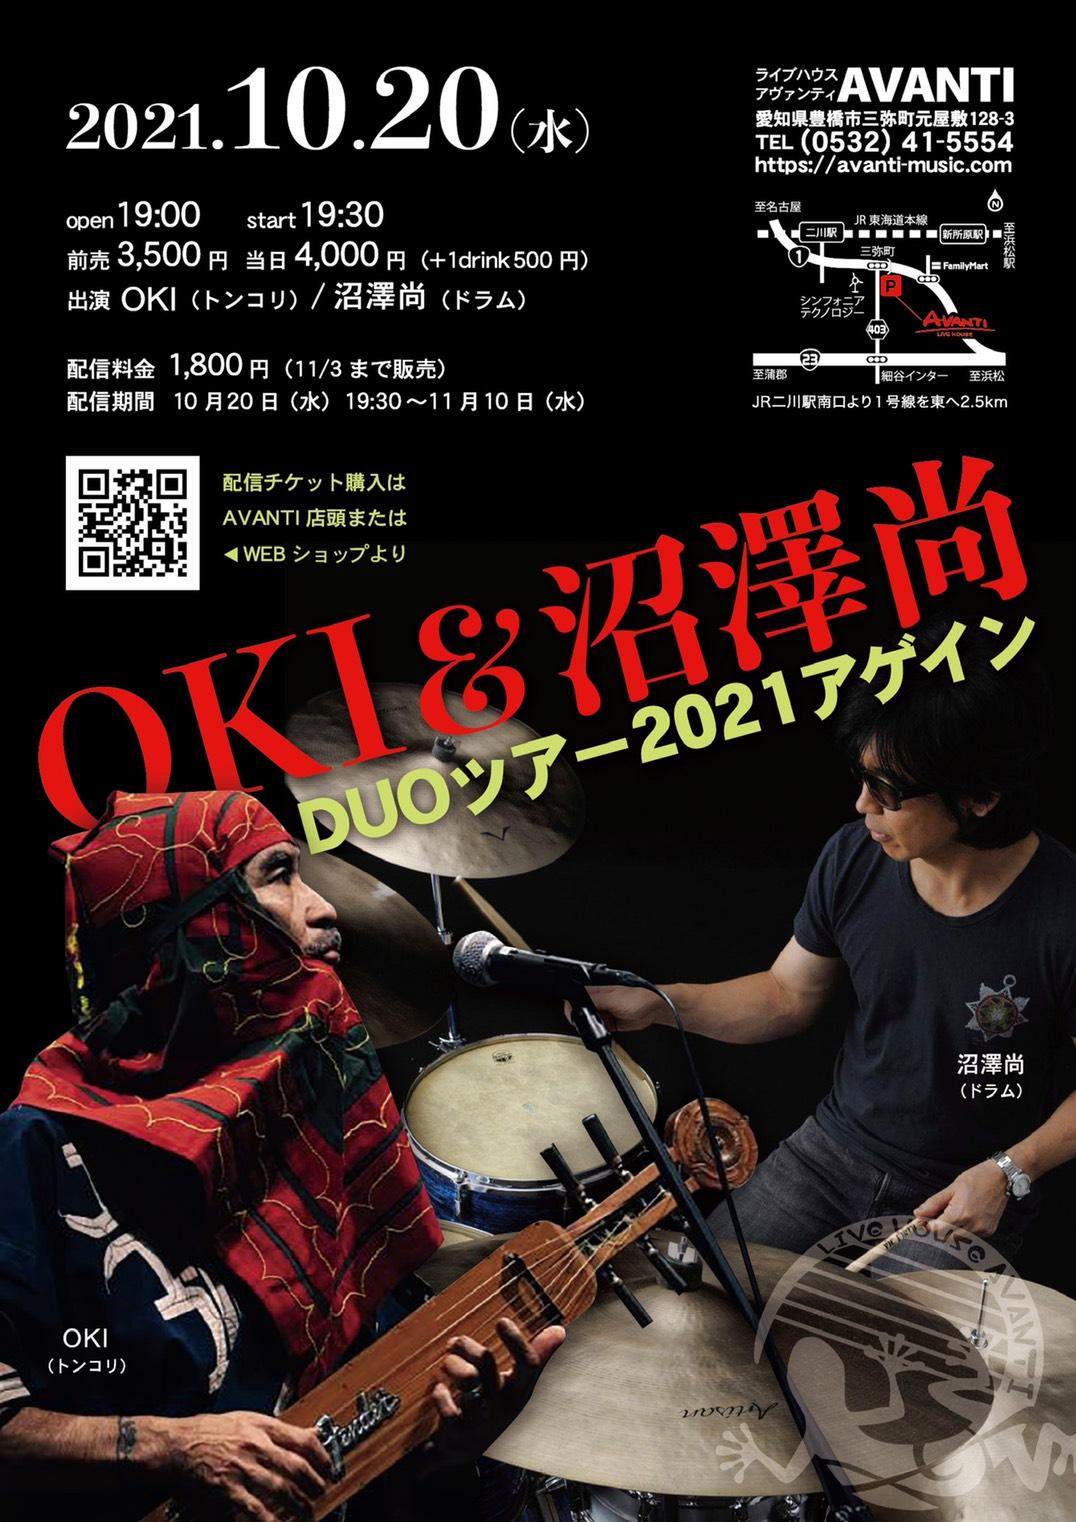 OKI&沼澤尚 DUOツアー2021アゲイン【有観客&LIVE配信】